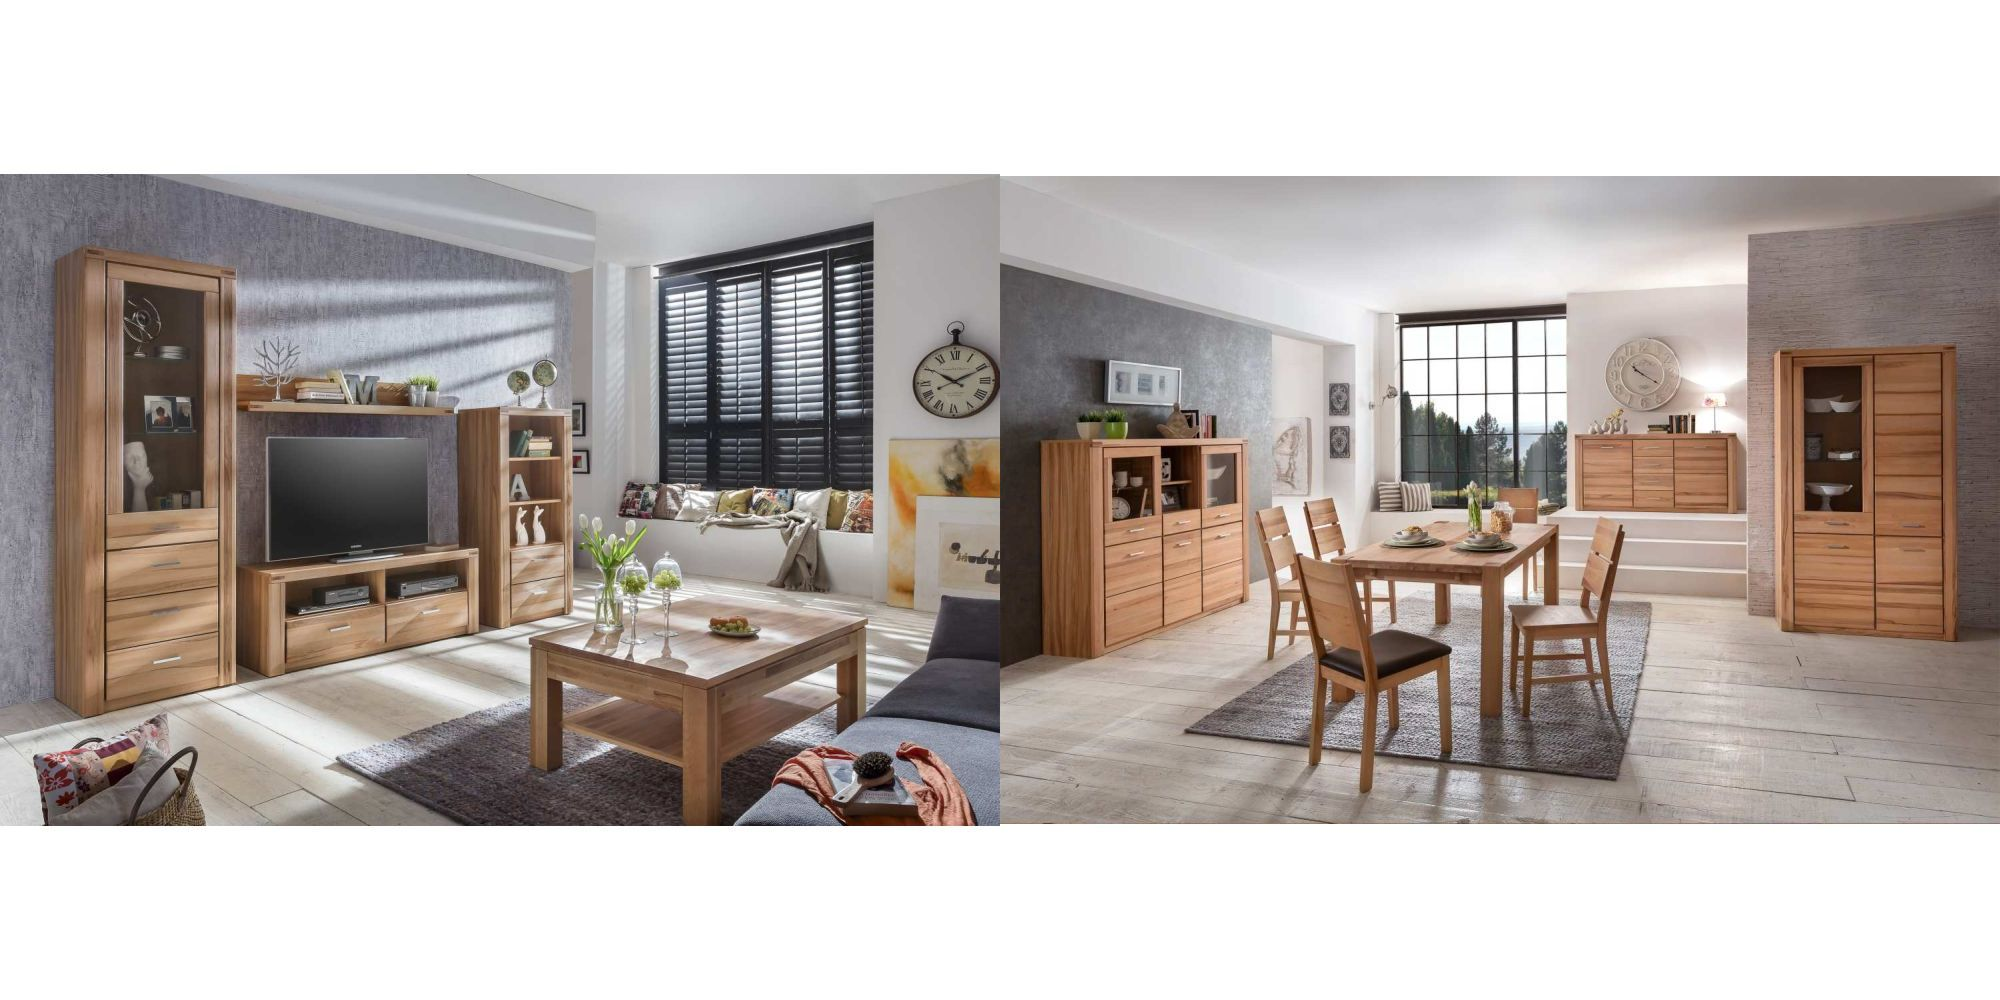 wohnwand anbauwand schrankwand lea kernbuche ge lt. Black Bedroom Furniture Sets. Home Design Ideas